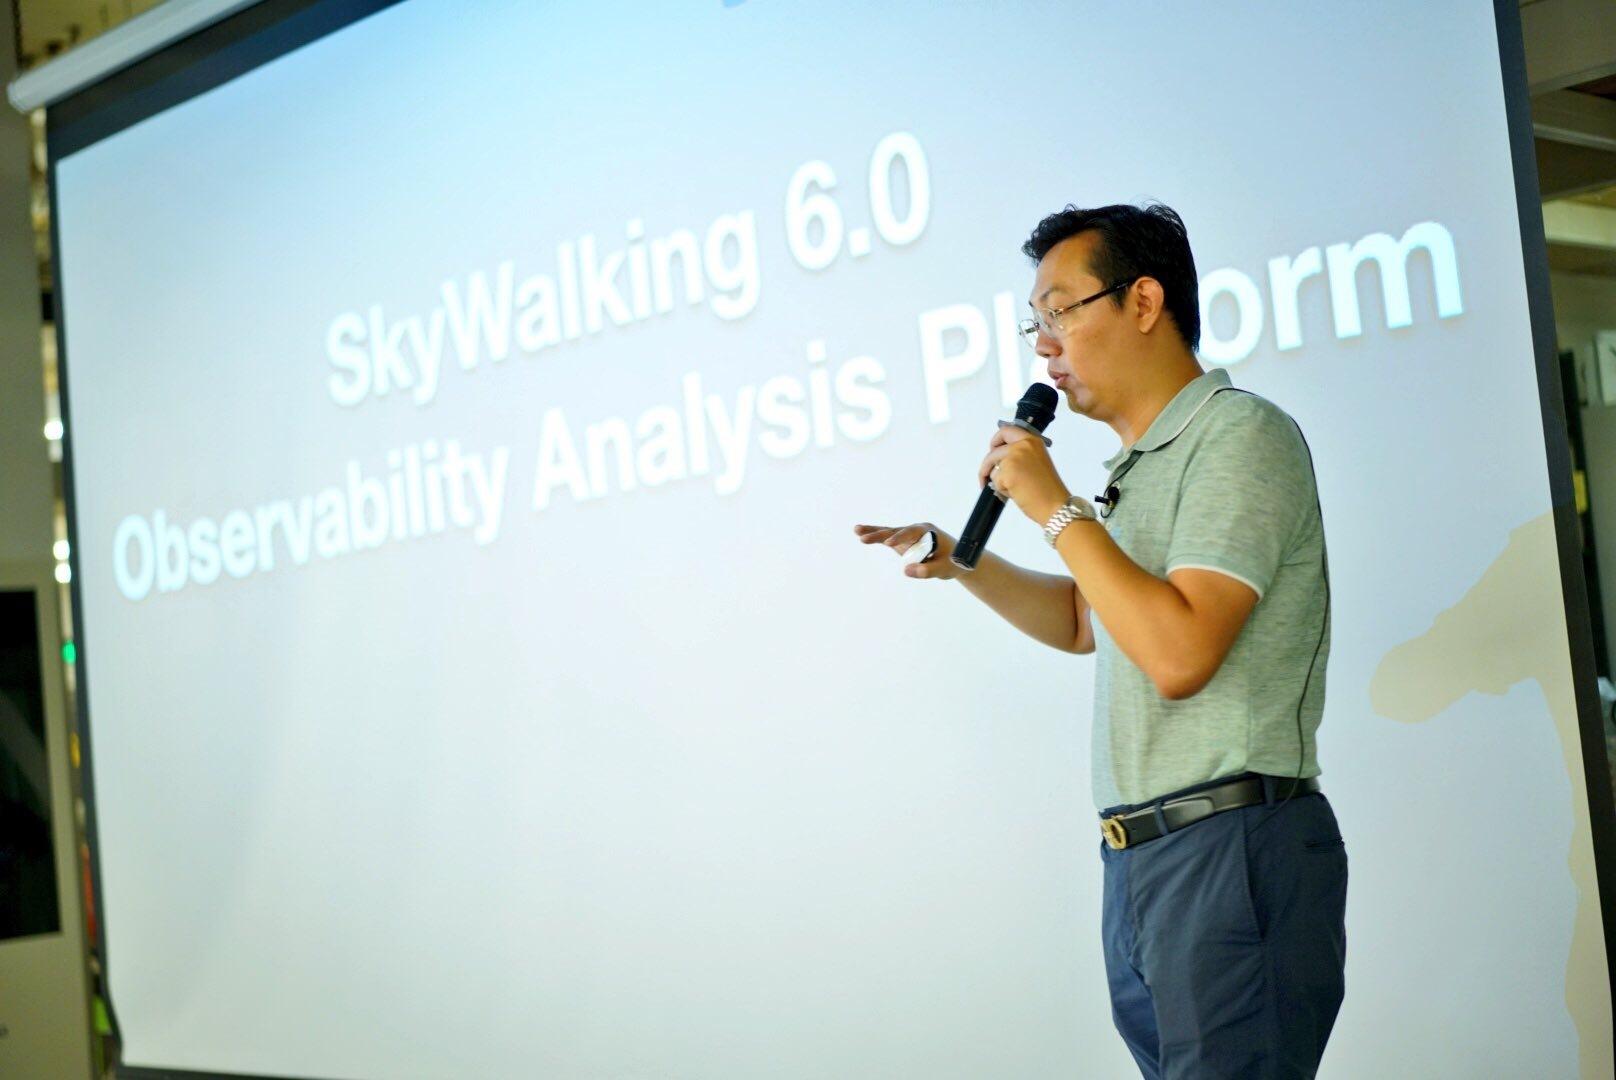 吴晟 Apache SkyWalking